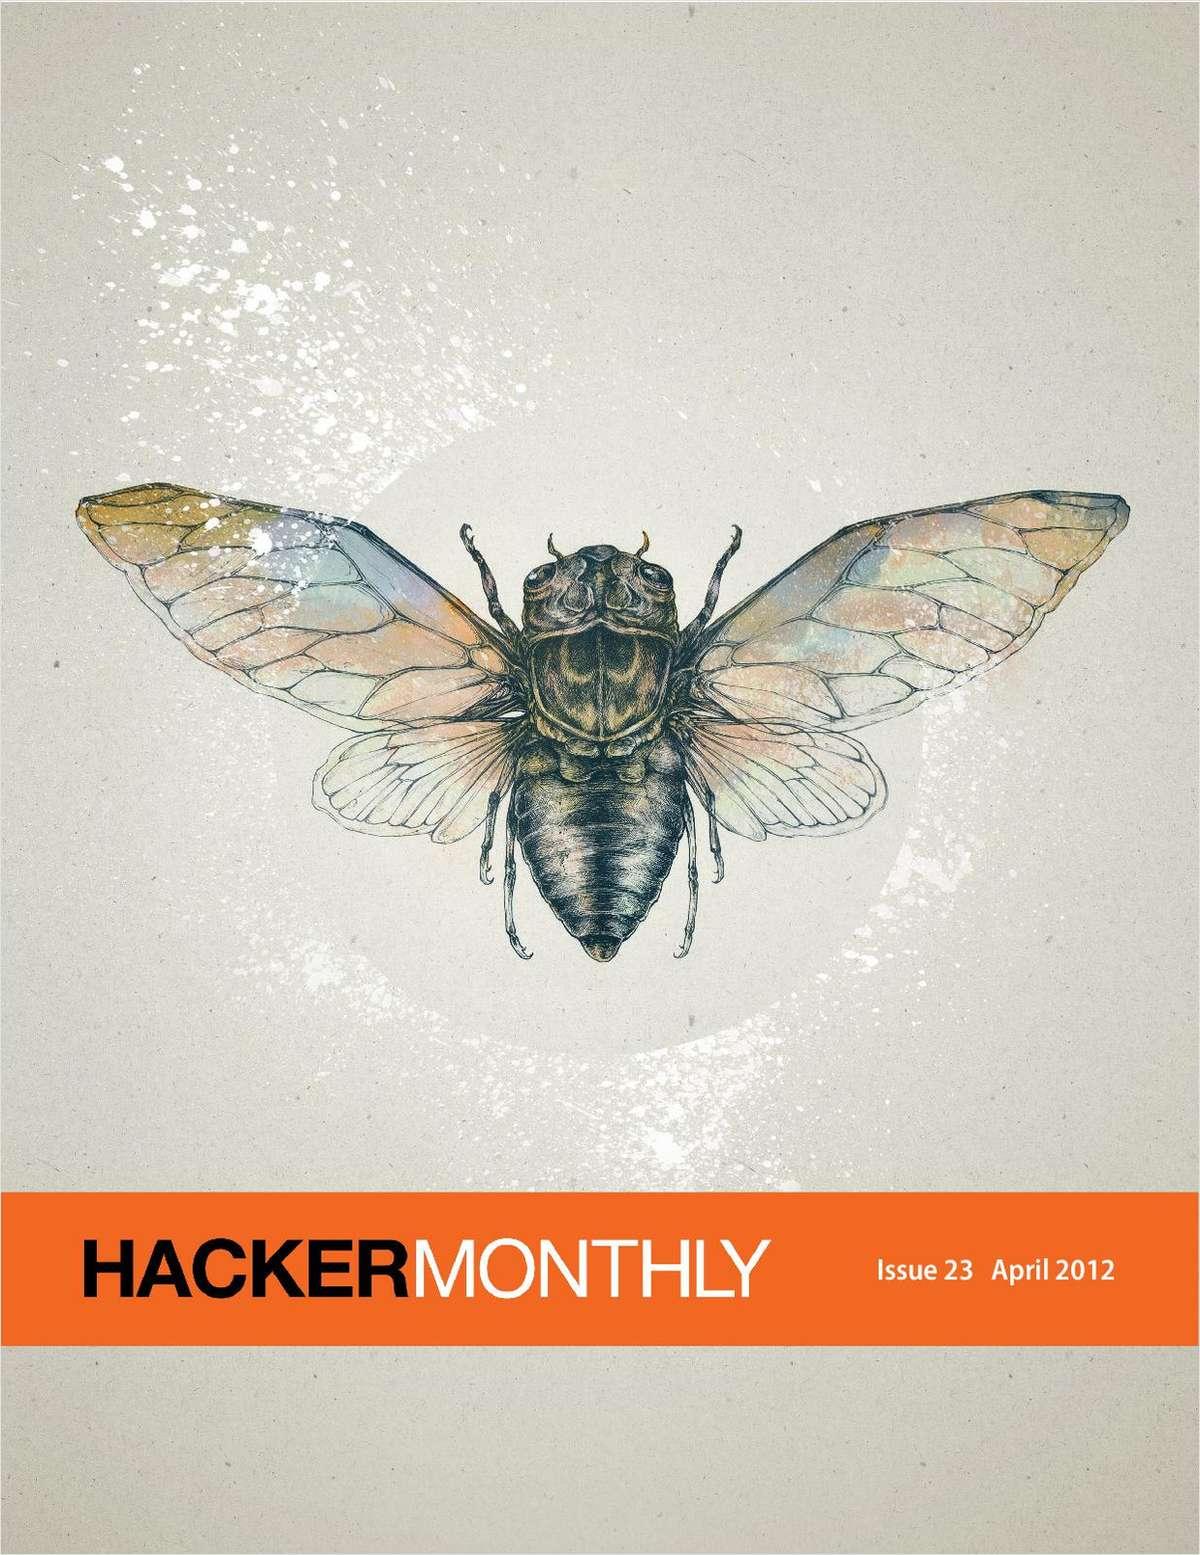 Hacker Monthly -- The Cicada Principle